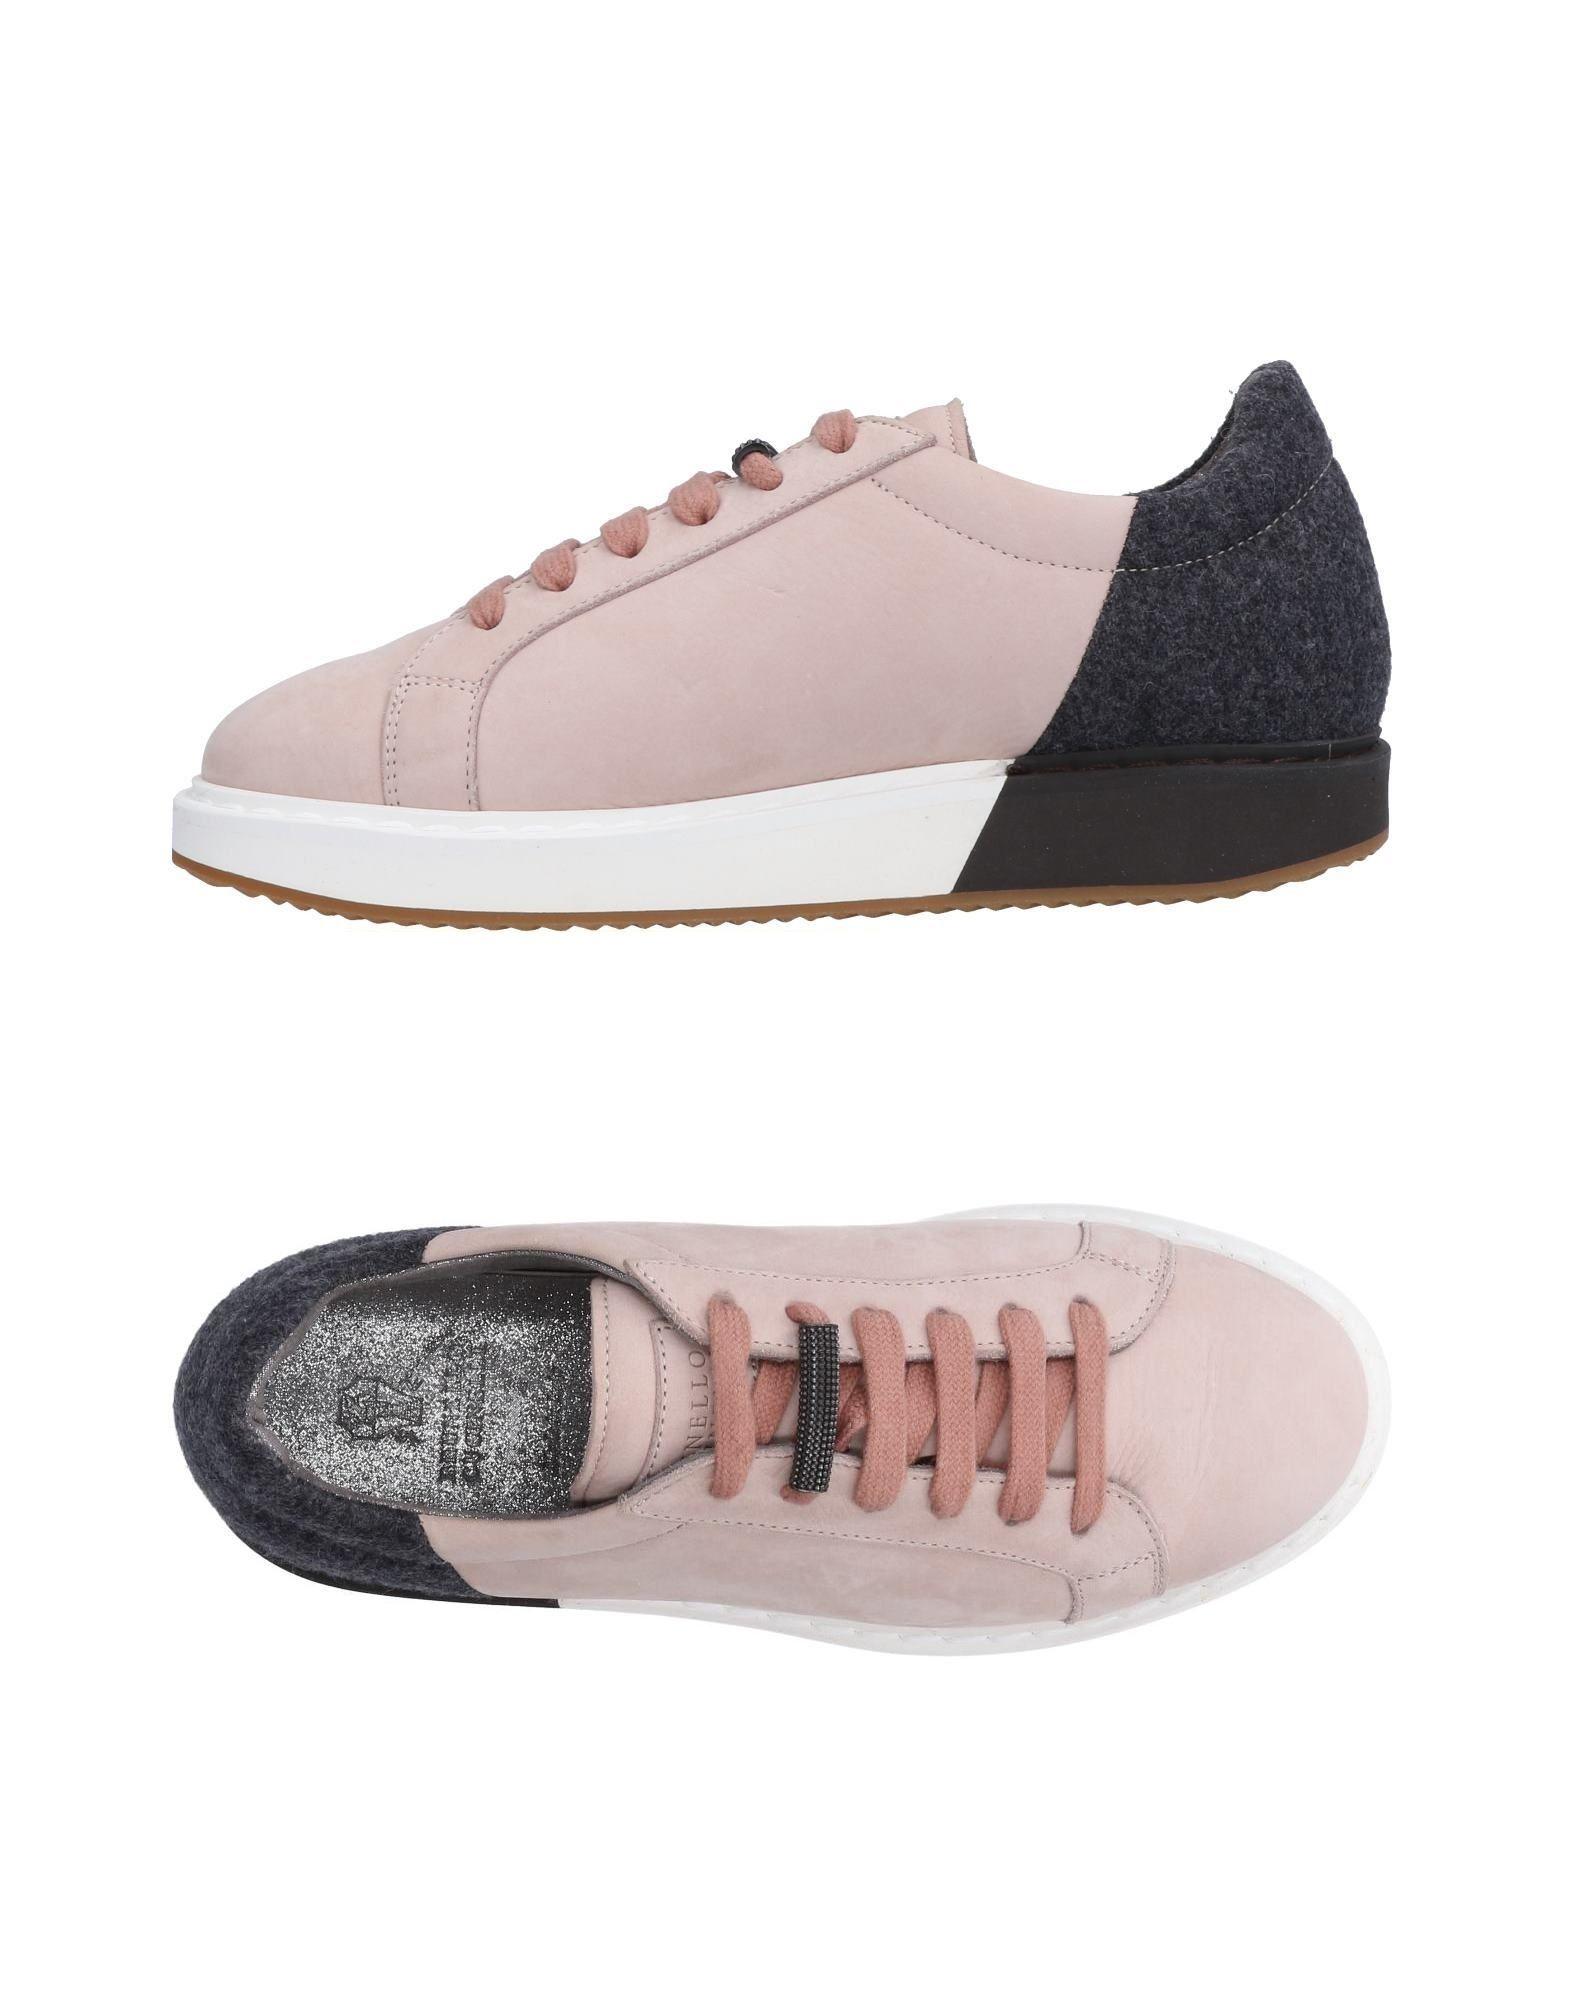 Brunello Cucinelli Sneakers Damen  11504929VF Beliebte Schuhe Schuhe Schuhe 9ec4d6